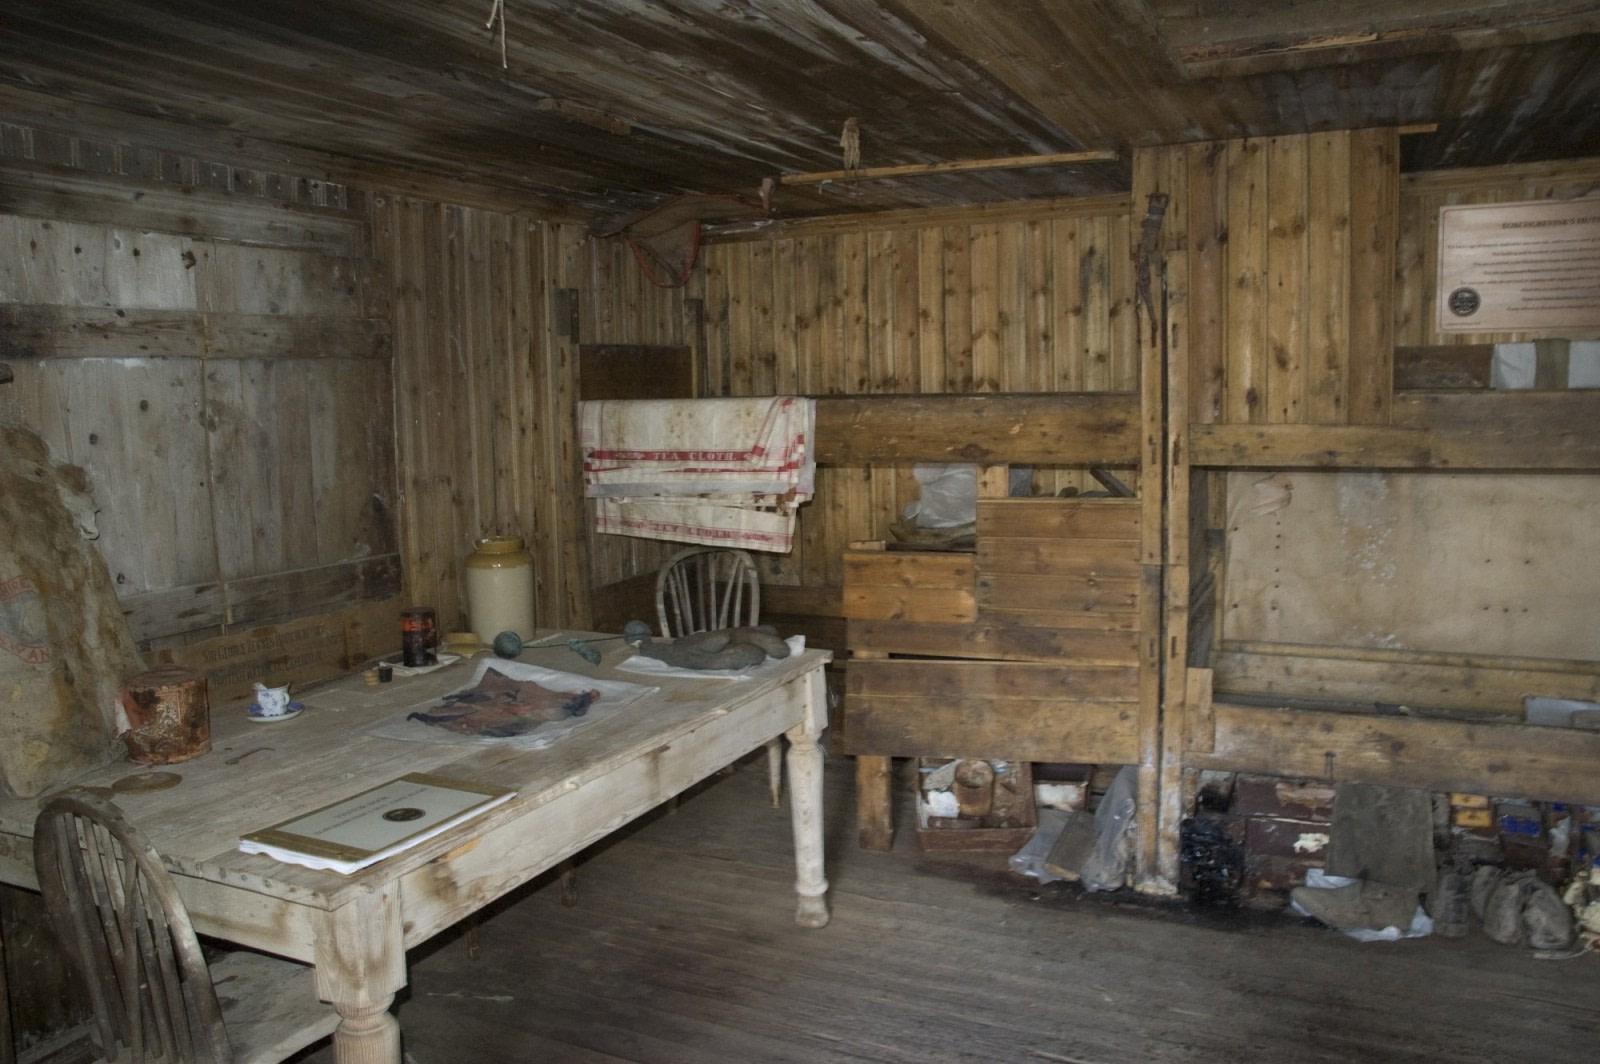 Refugio de Borchgrevink